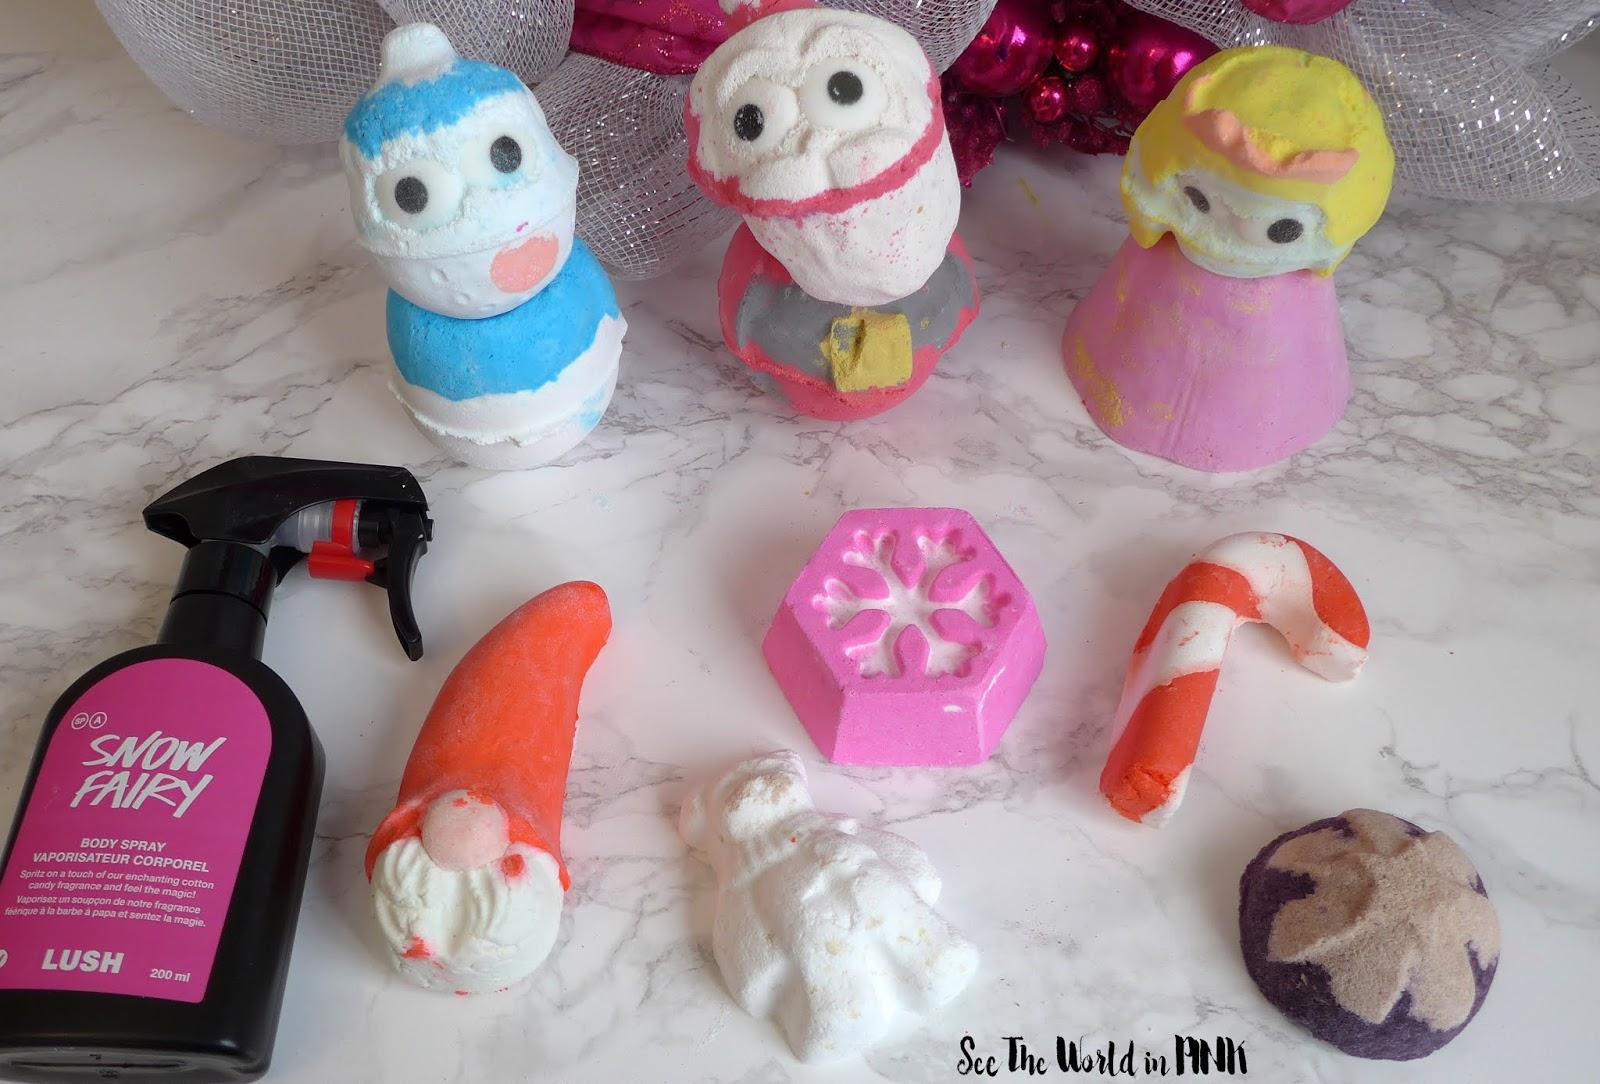 Christmas Bath Bombs Lush.Lush Christmas Products Bath Bombs Bubble Bars Scrubs